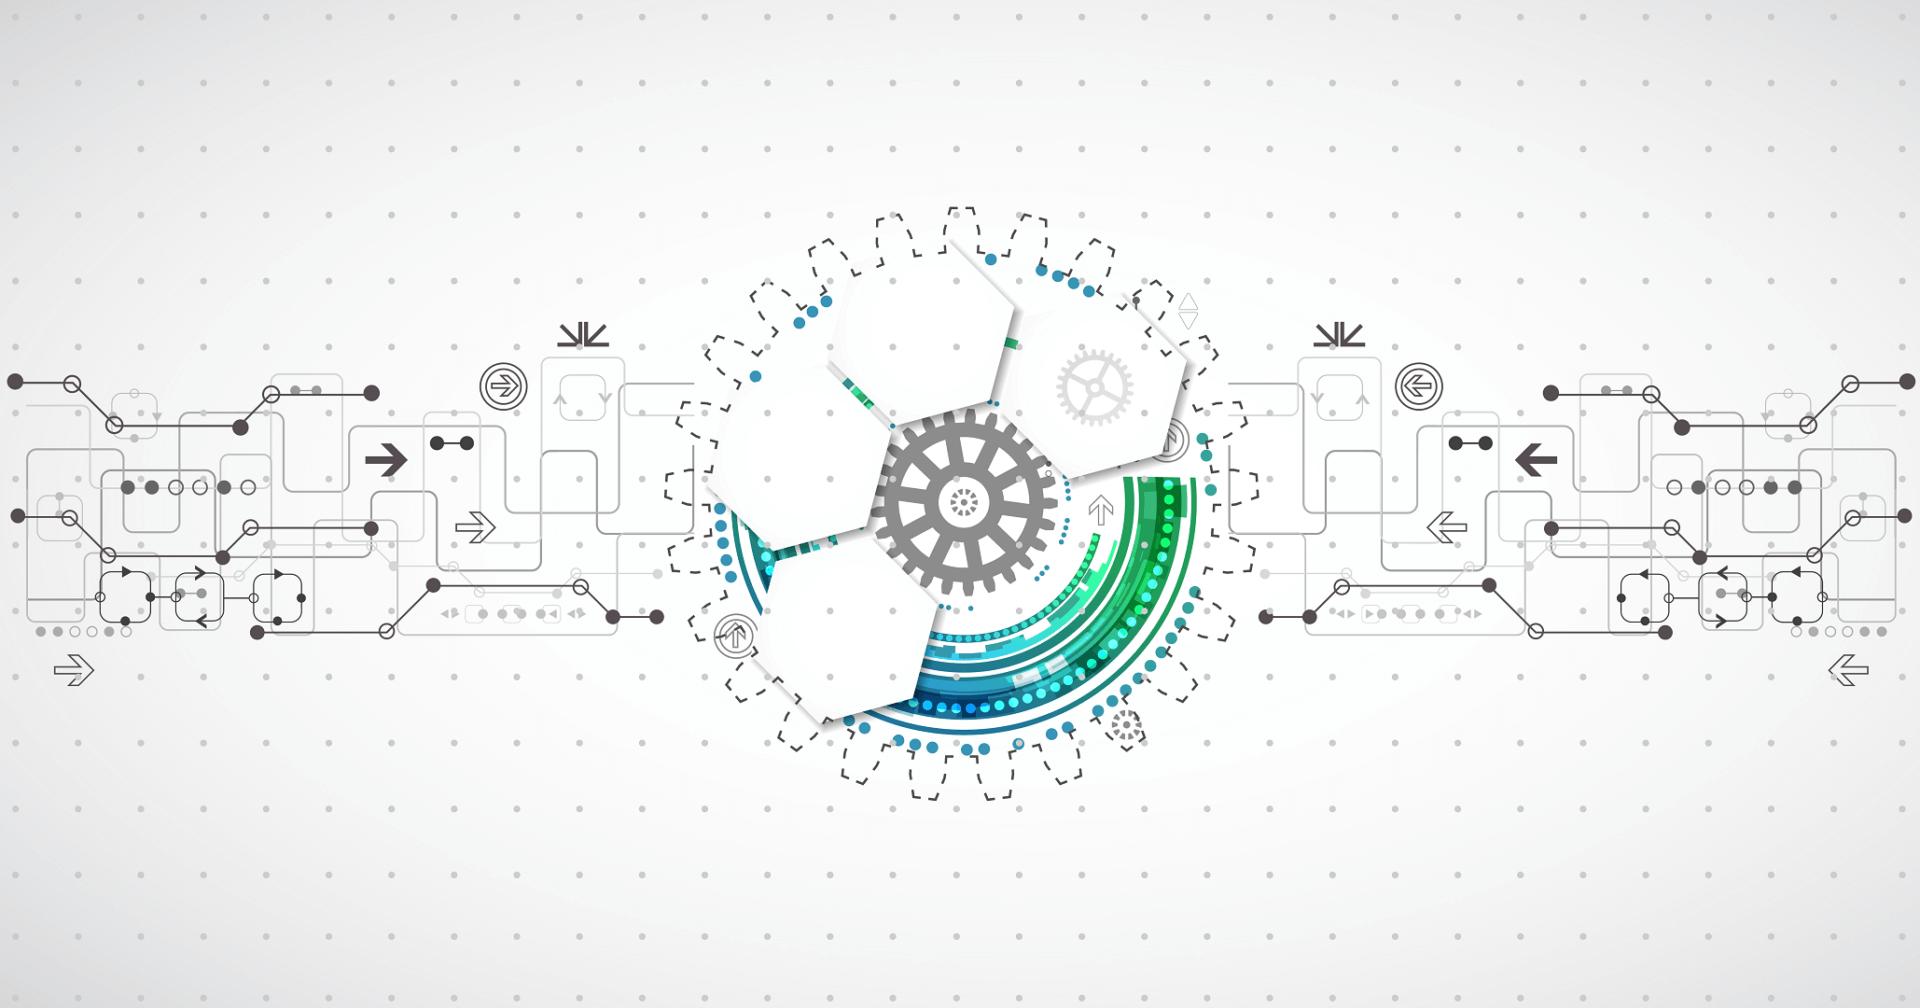 automation-technology-gear-ss-1920